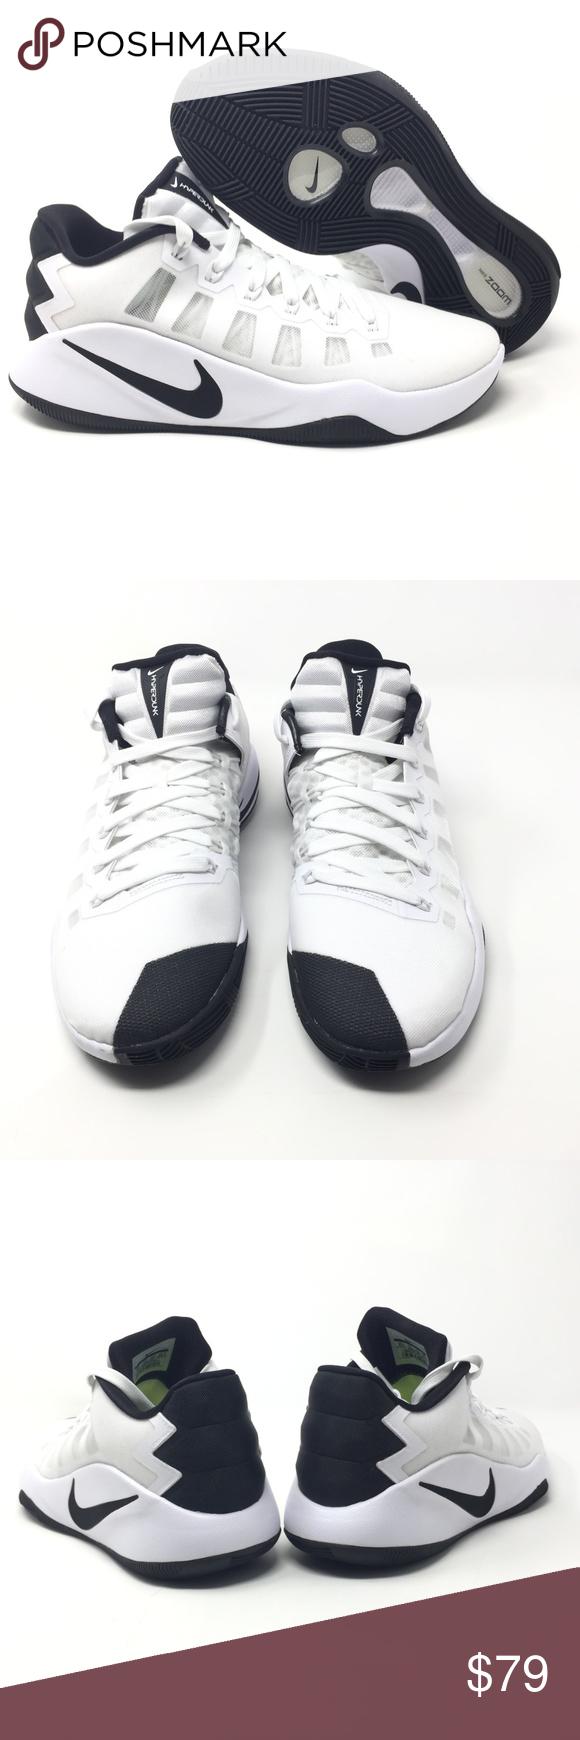 9d3d42dcf988 Nike Hyperdunk 2016 Low Men s Size 10.5 White Blac Nike Hyperdunk 2016 Low  Men s Size